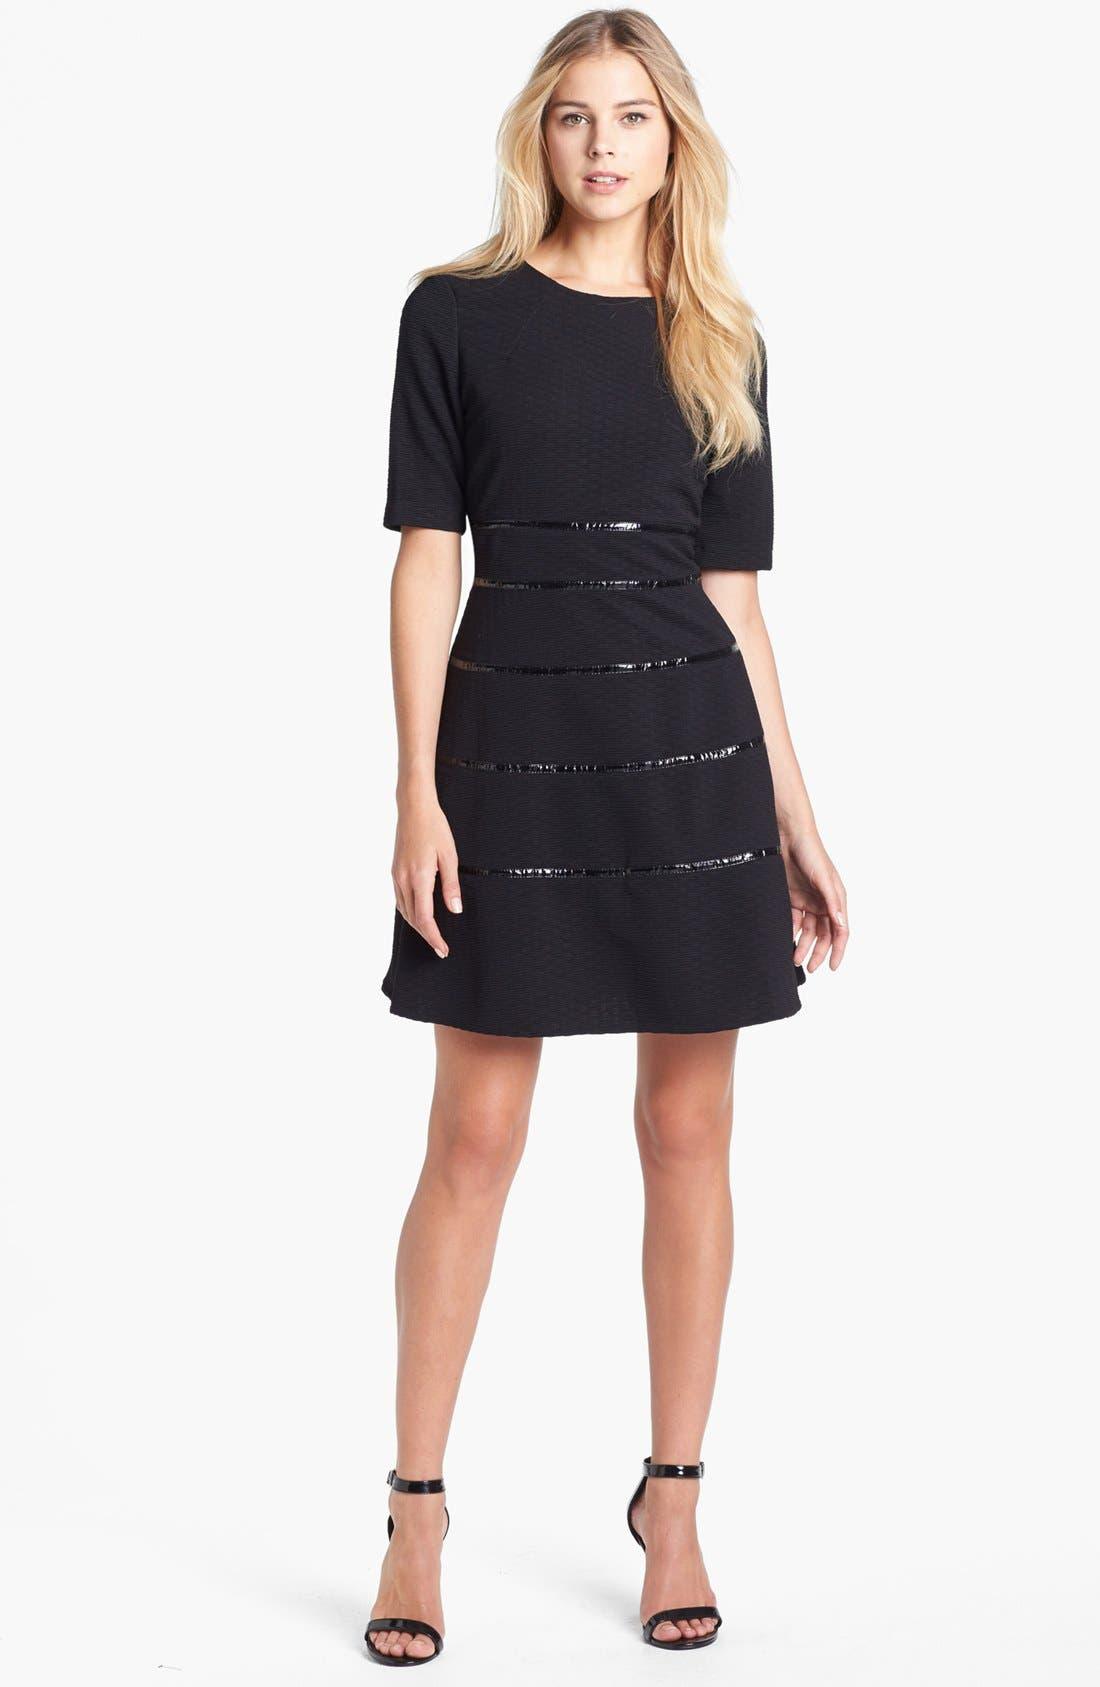 Alternate Image 1 Selected - Taylor Dresses Textured Fit & Flare Dress